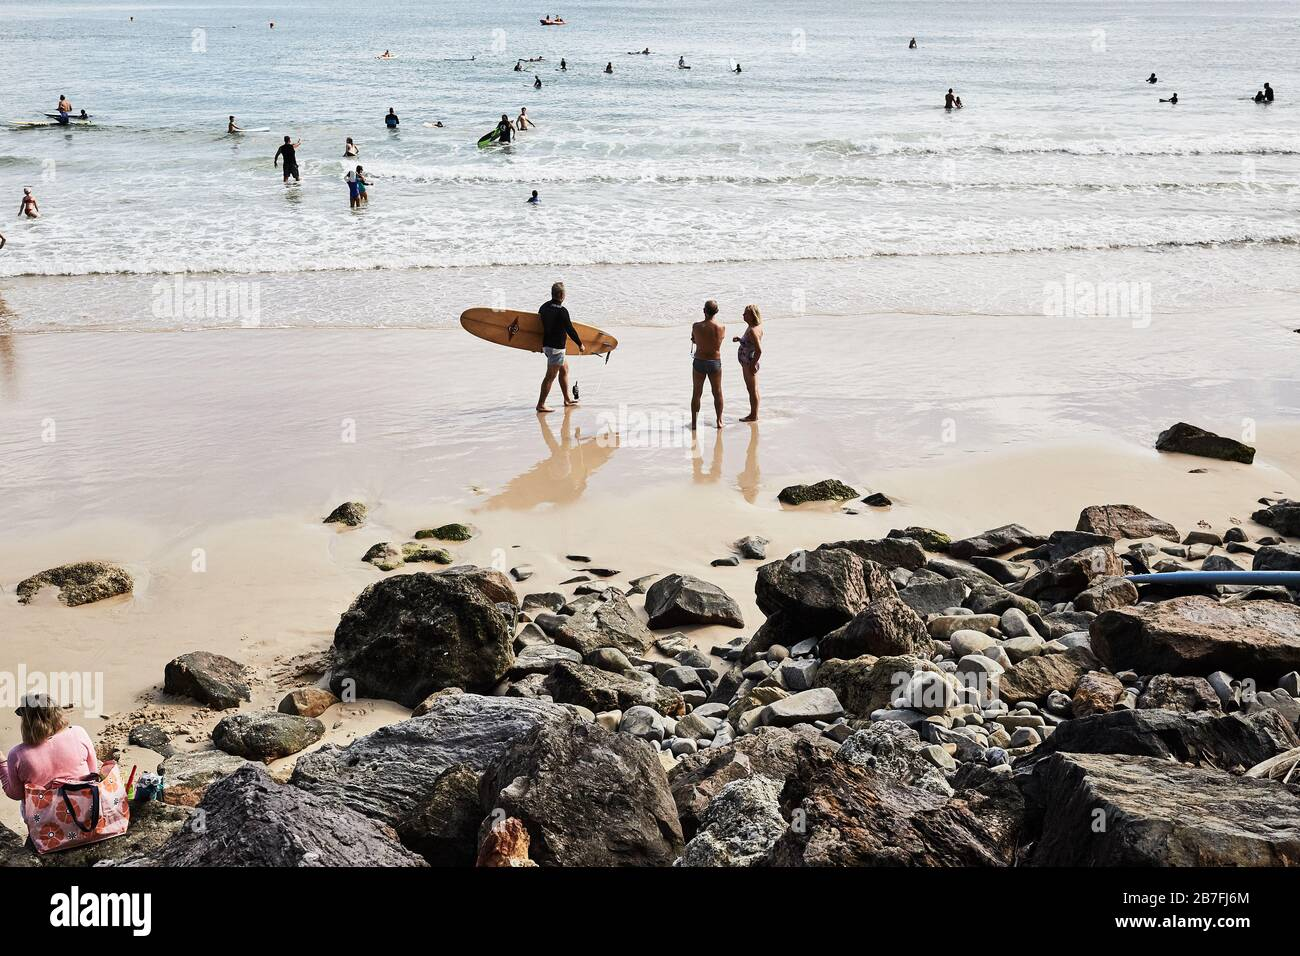 Crowds of people enjoying sunbathing, surfing and life on Noosa Main Beach, Queensland, Australia Stock Photo